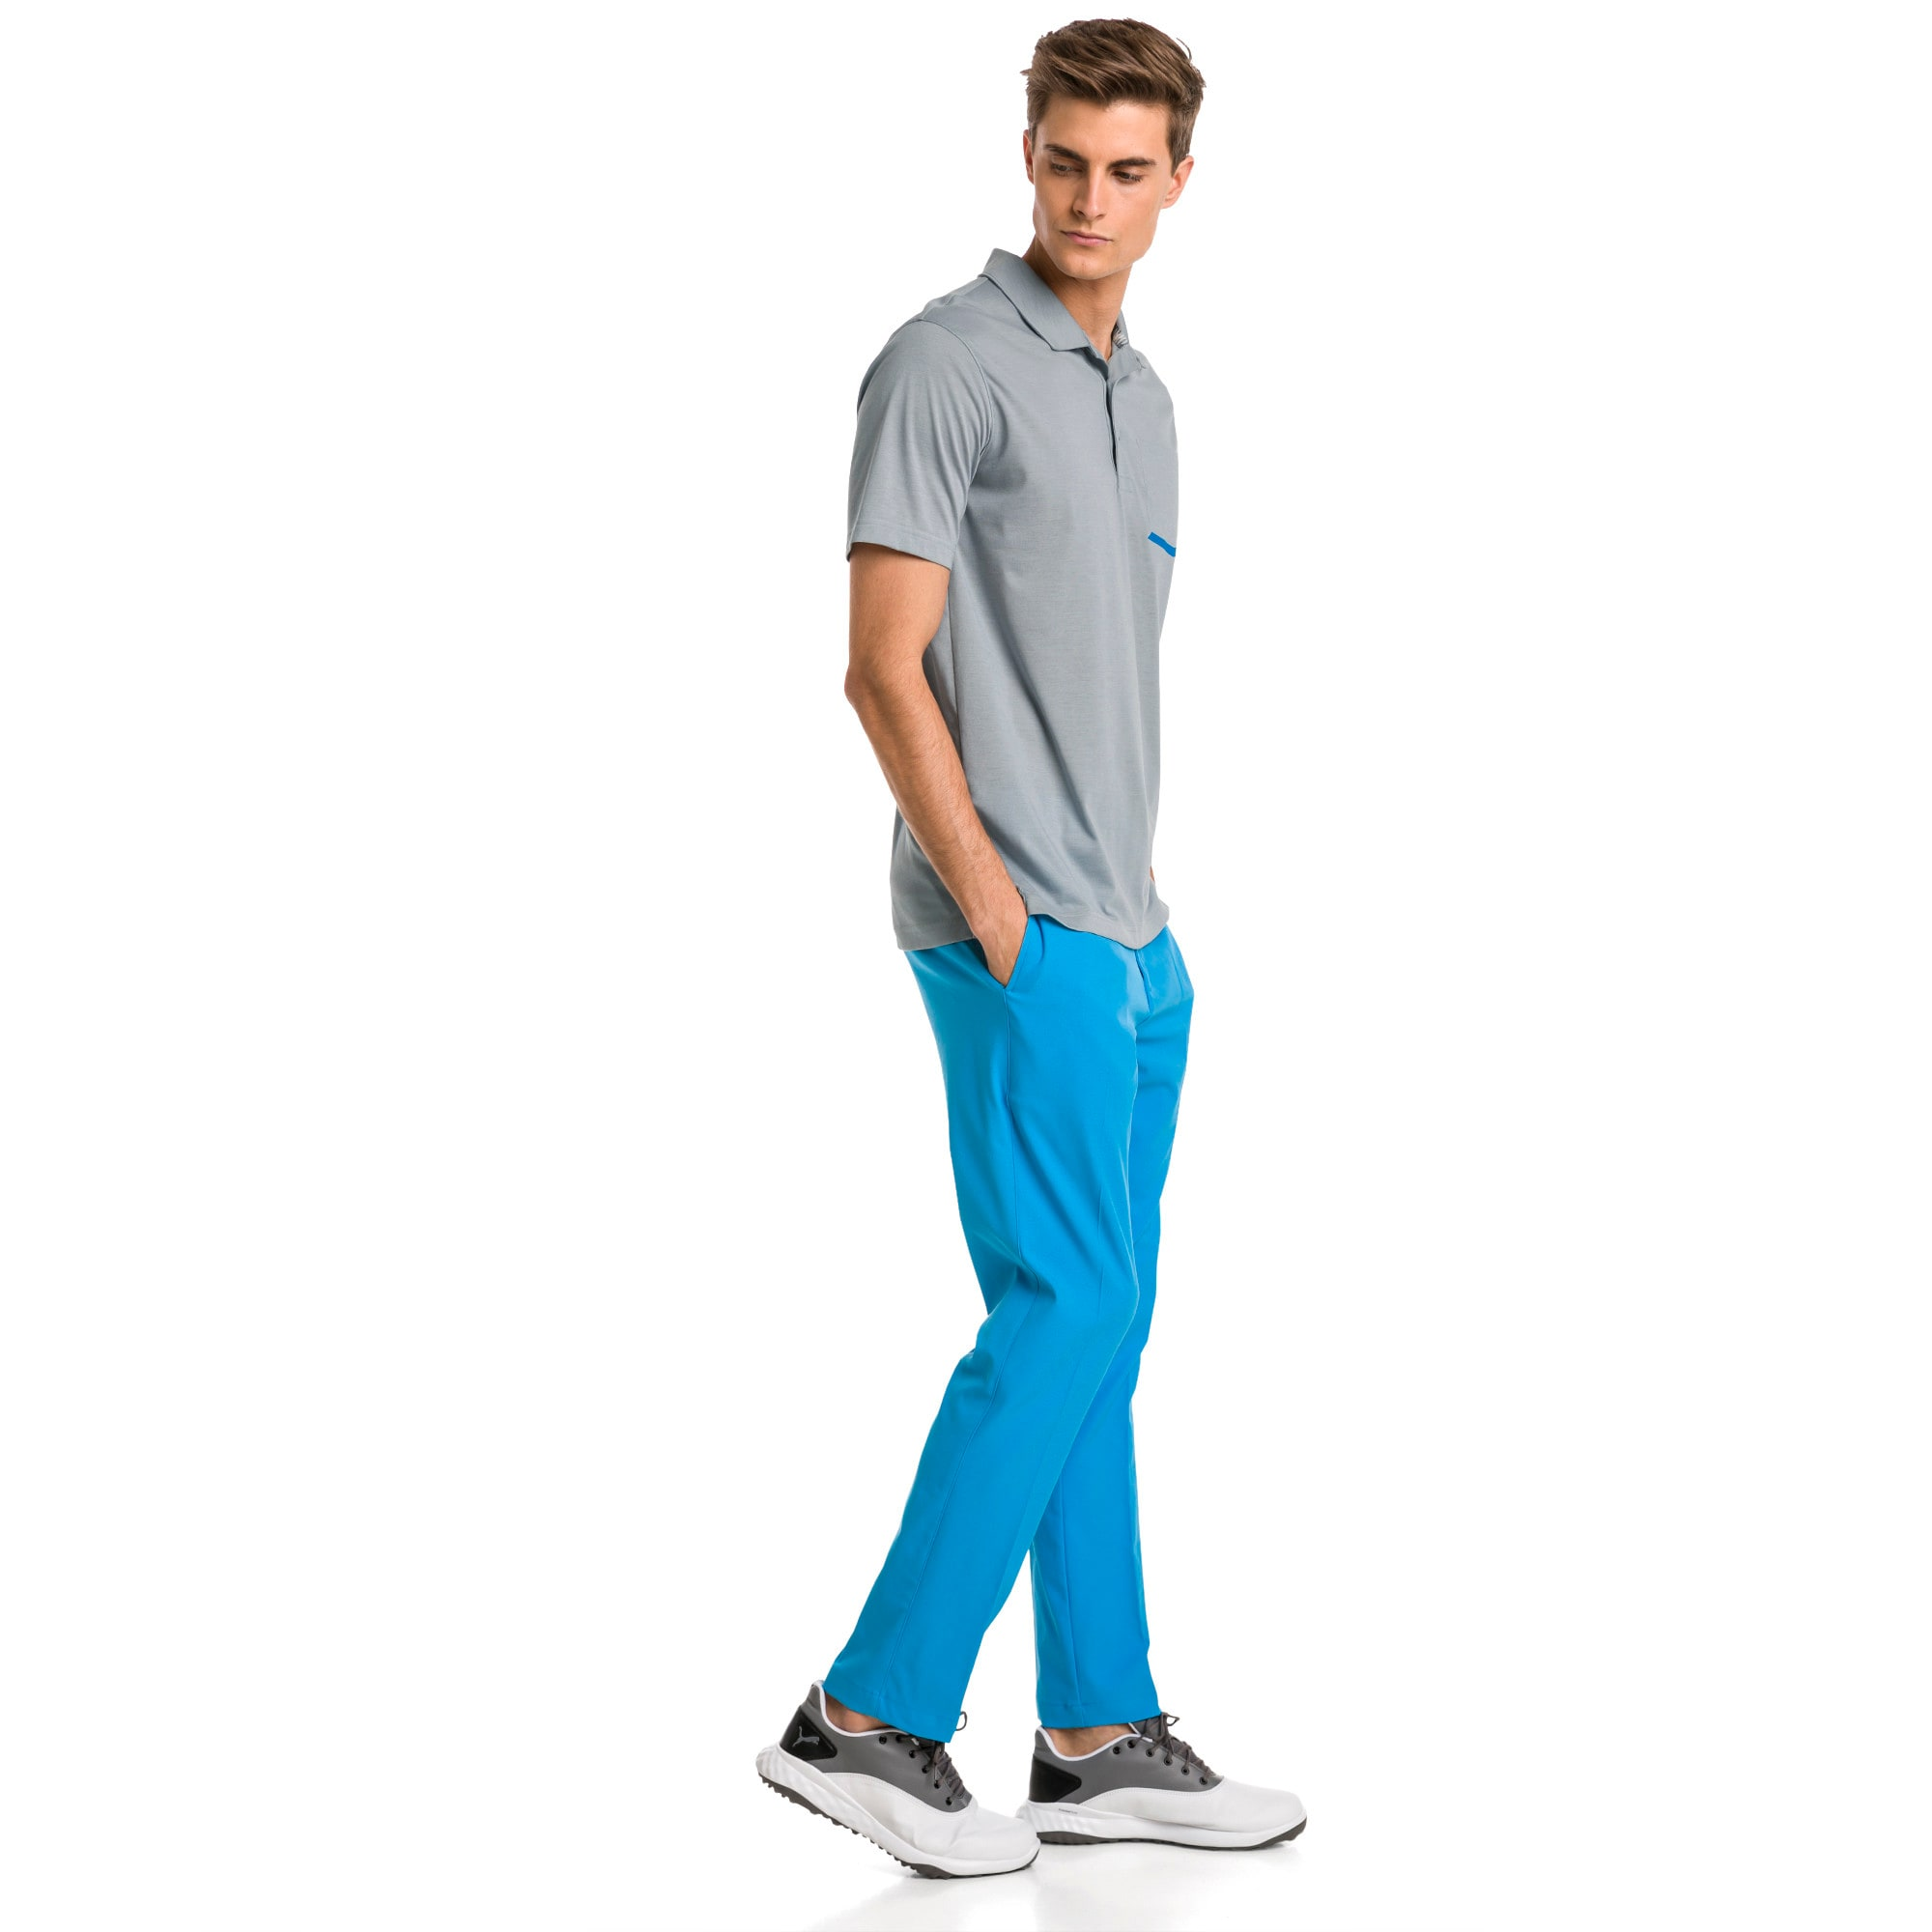 Thumbnail 3 of Afkledende geweven Jackpot golfbroek voor heren, Bleu Azur, medium